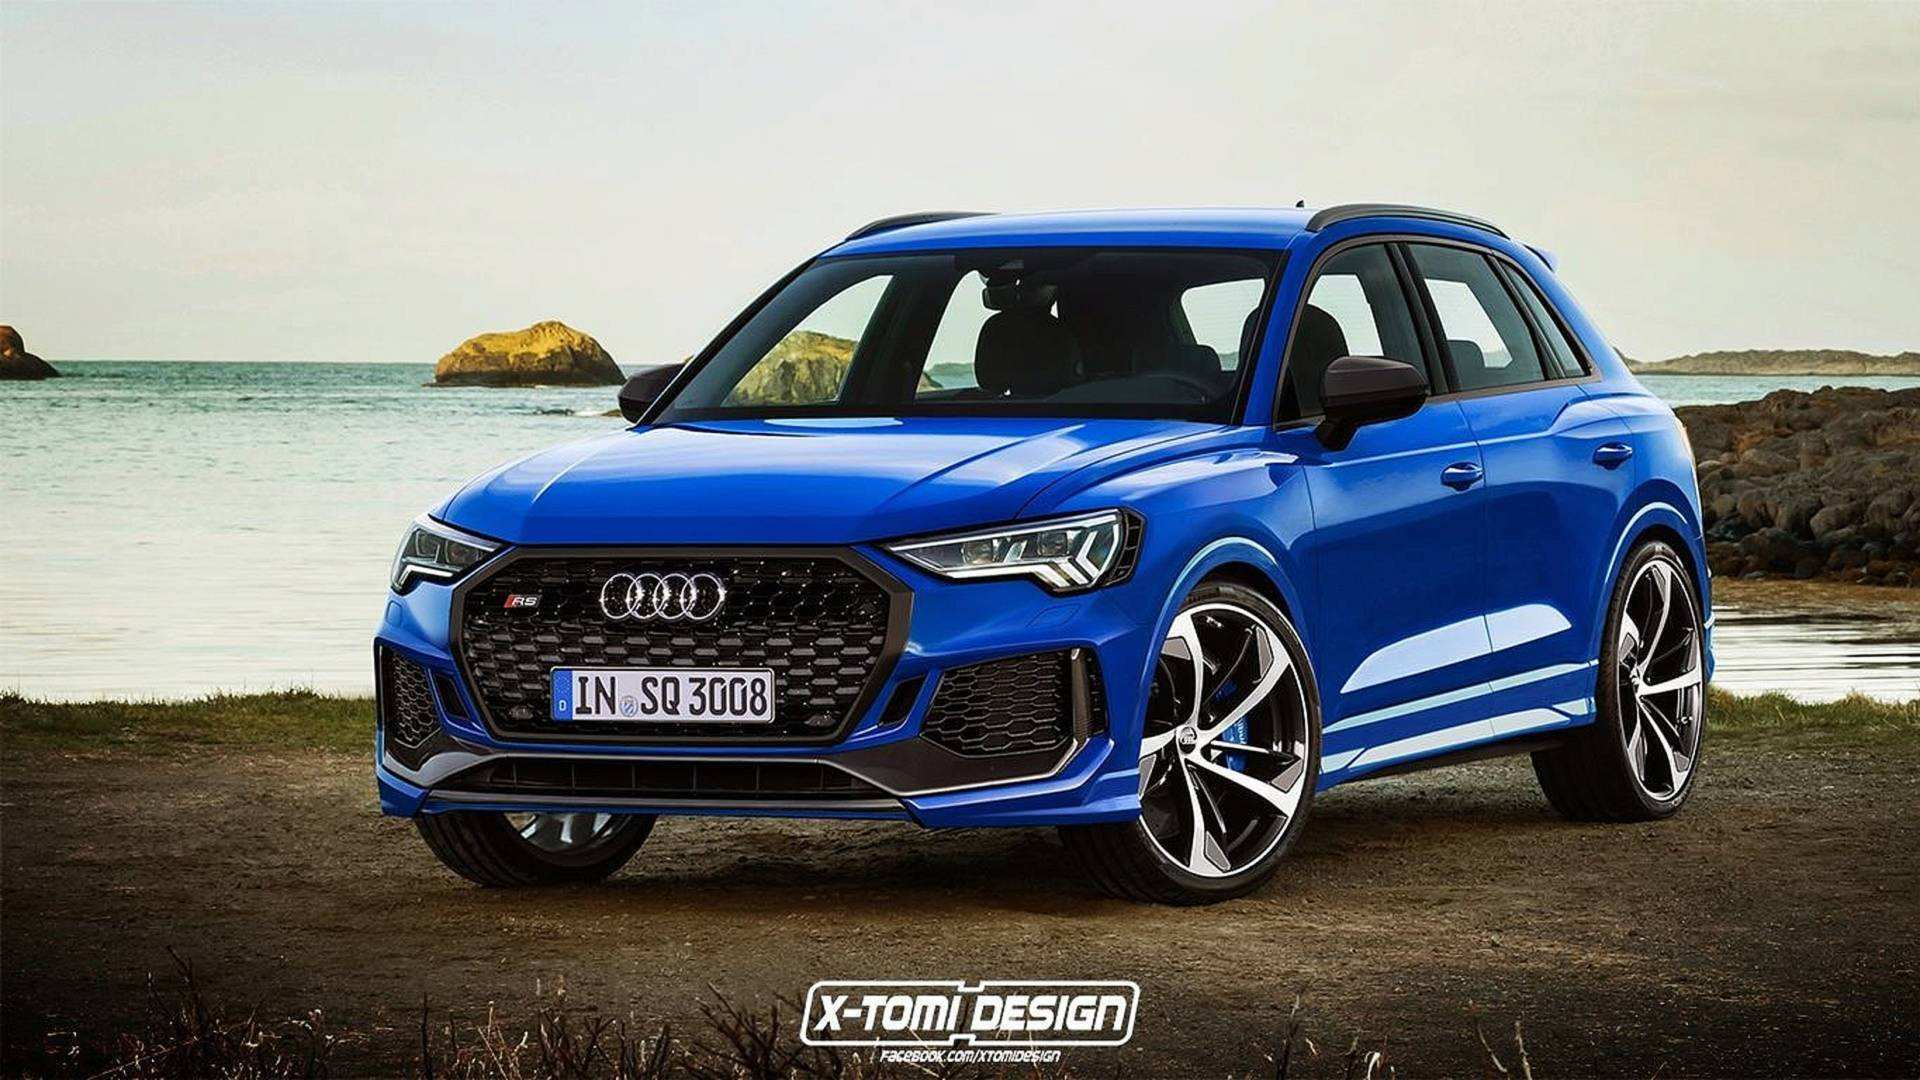 45 Great Audi Rsq3 2019 Release Date Interior for Audi Rsq3 2019 Release Date